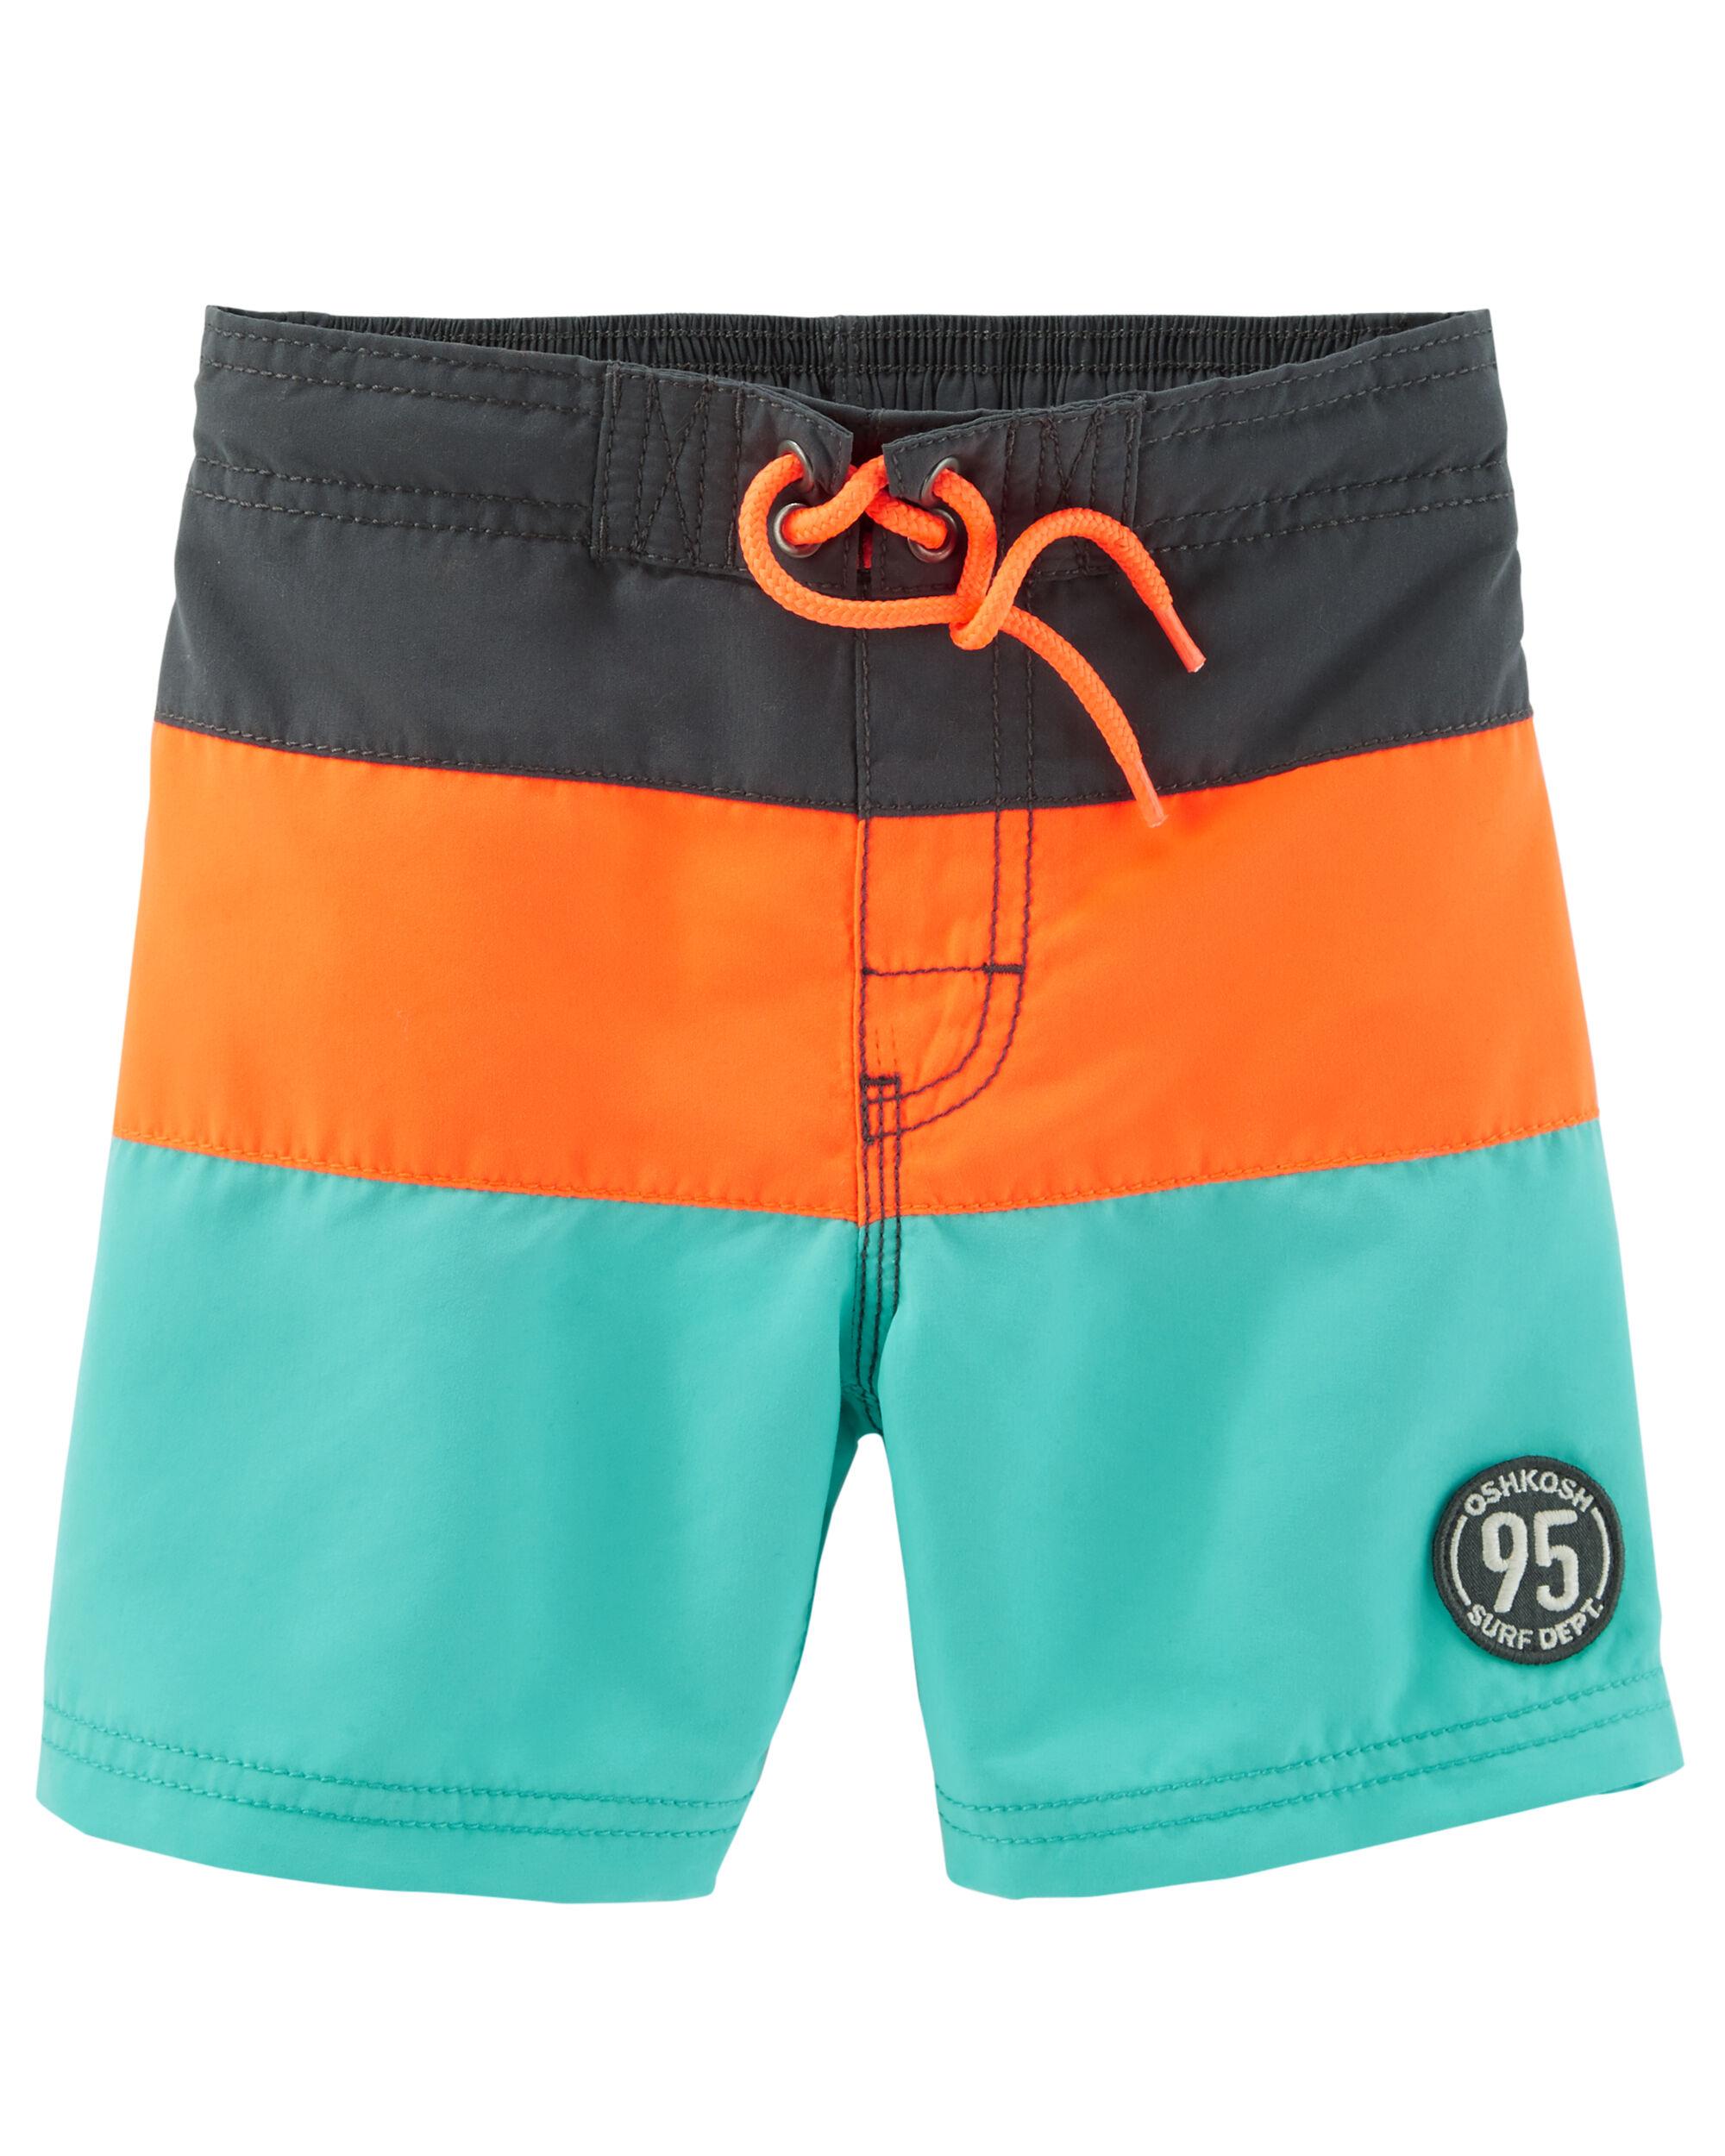 Kid Boy OshKosh Colorblock Swim Trunks   OshKosh.com Swim Trunks on swim toys, swim sandals, swim robes for women, swim jammer, swim dress, swim blankets, swim rash guard, swim shorts, swim goggles, compression shorts, swim pants, swim camisole, one-piece swimsuit, swim capris for women, swim boots, boxer shorts, square leg suits, swim briefs france, swim tights, swim skort, boxer briefs,